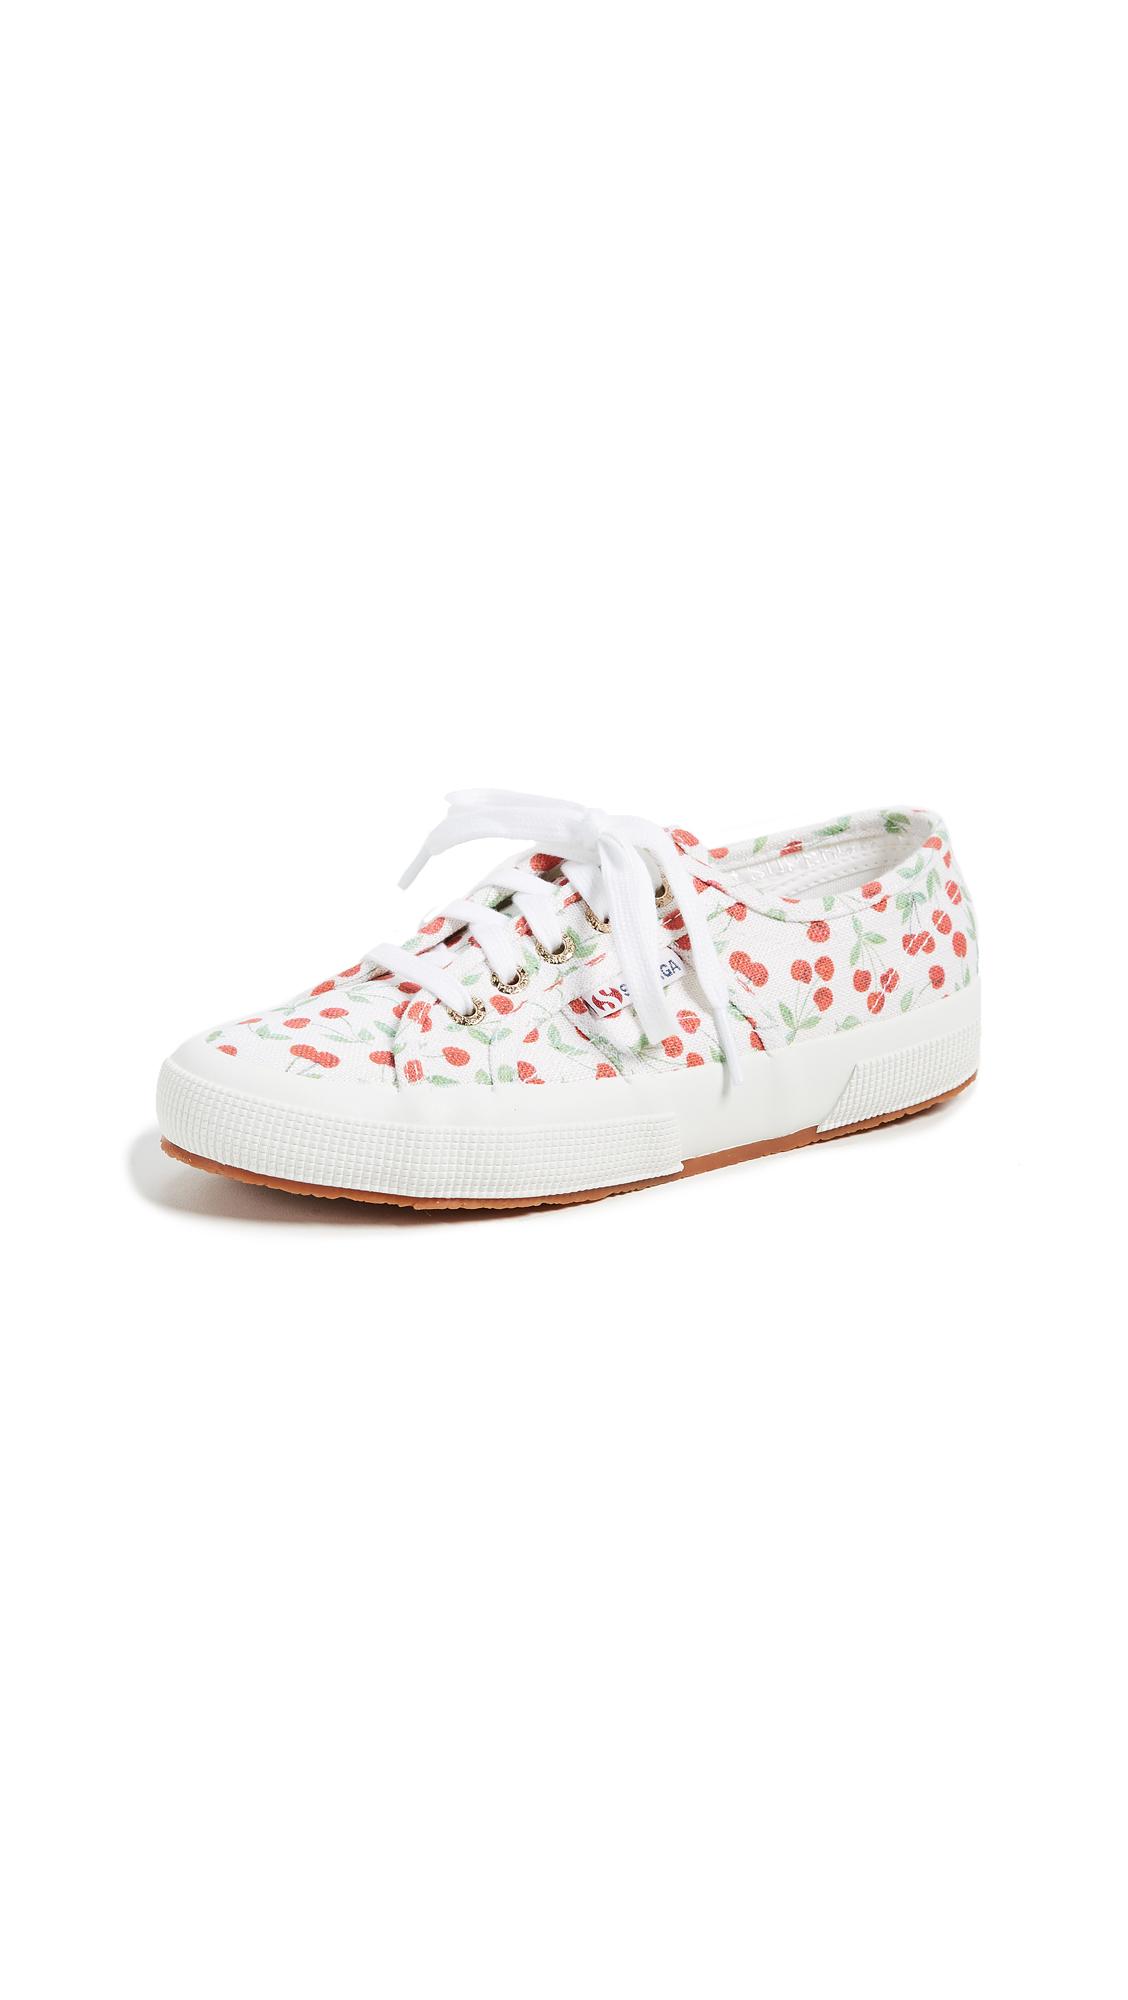 Superga 2750 Cherry Sneakers - Cherry